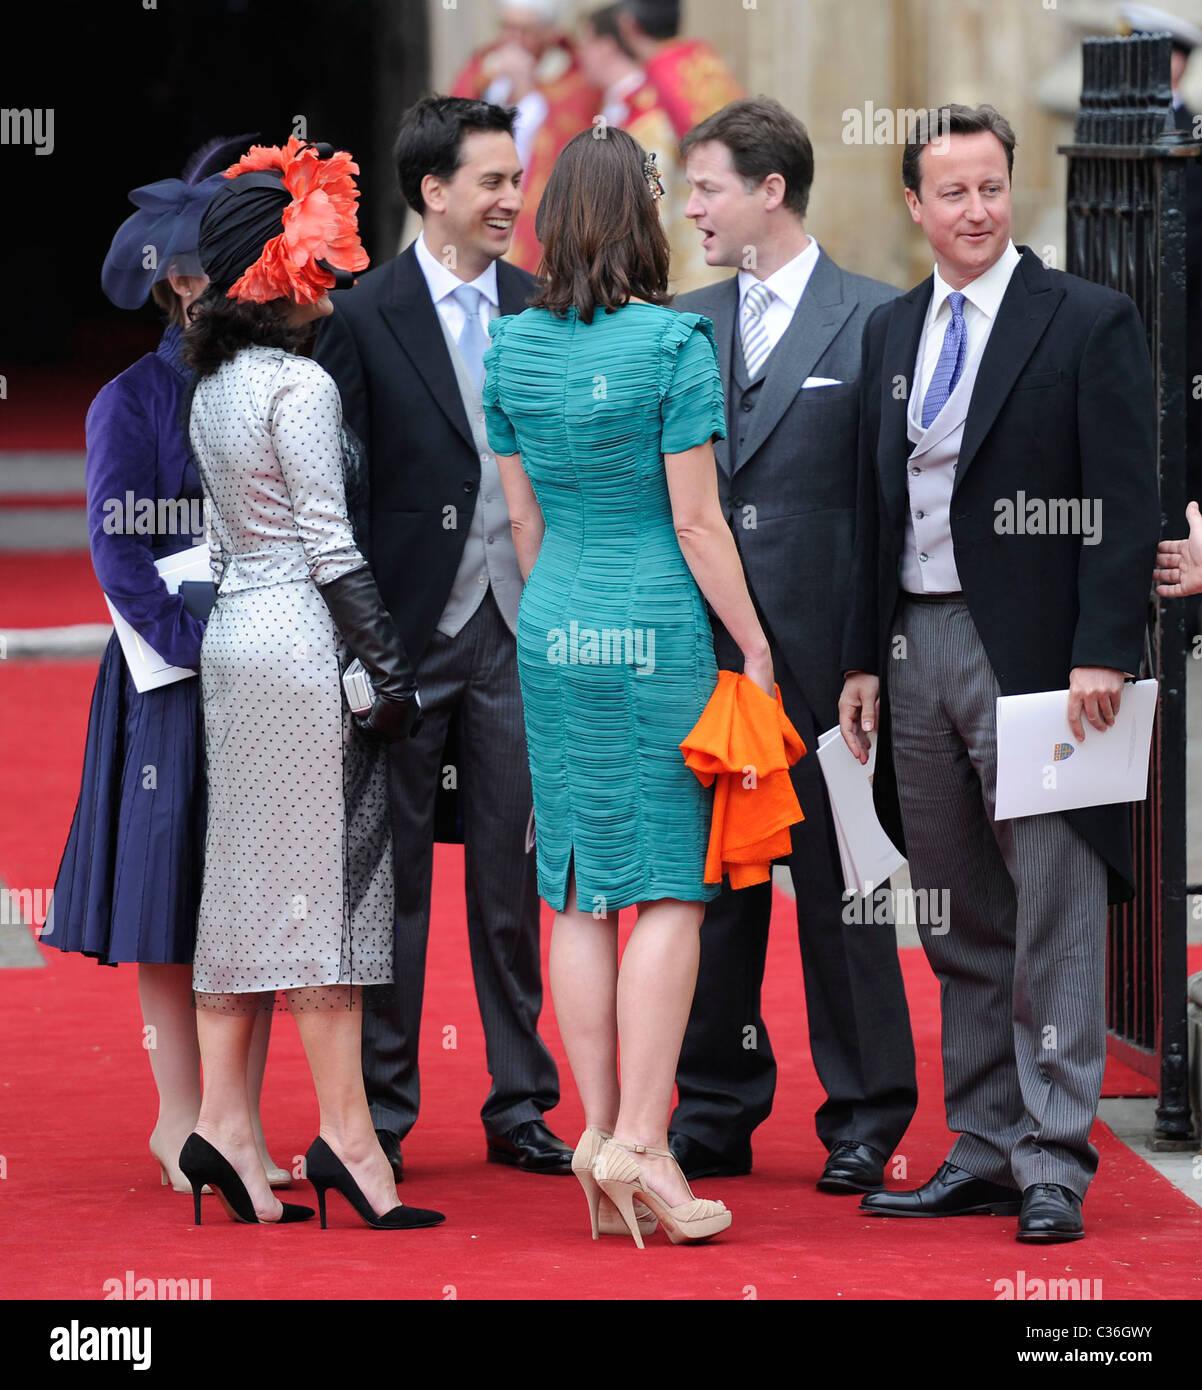 Prince Ed Stock Photos & Prince Ed Stock Images - Alamy